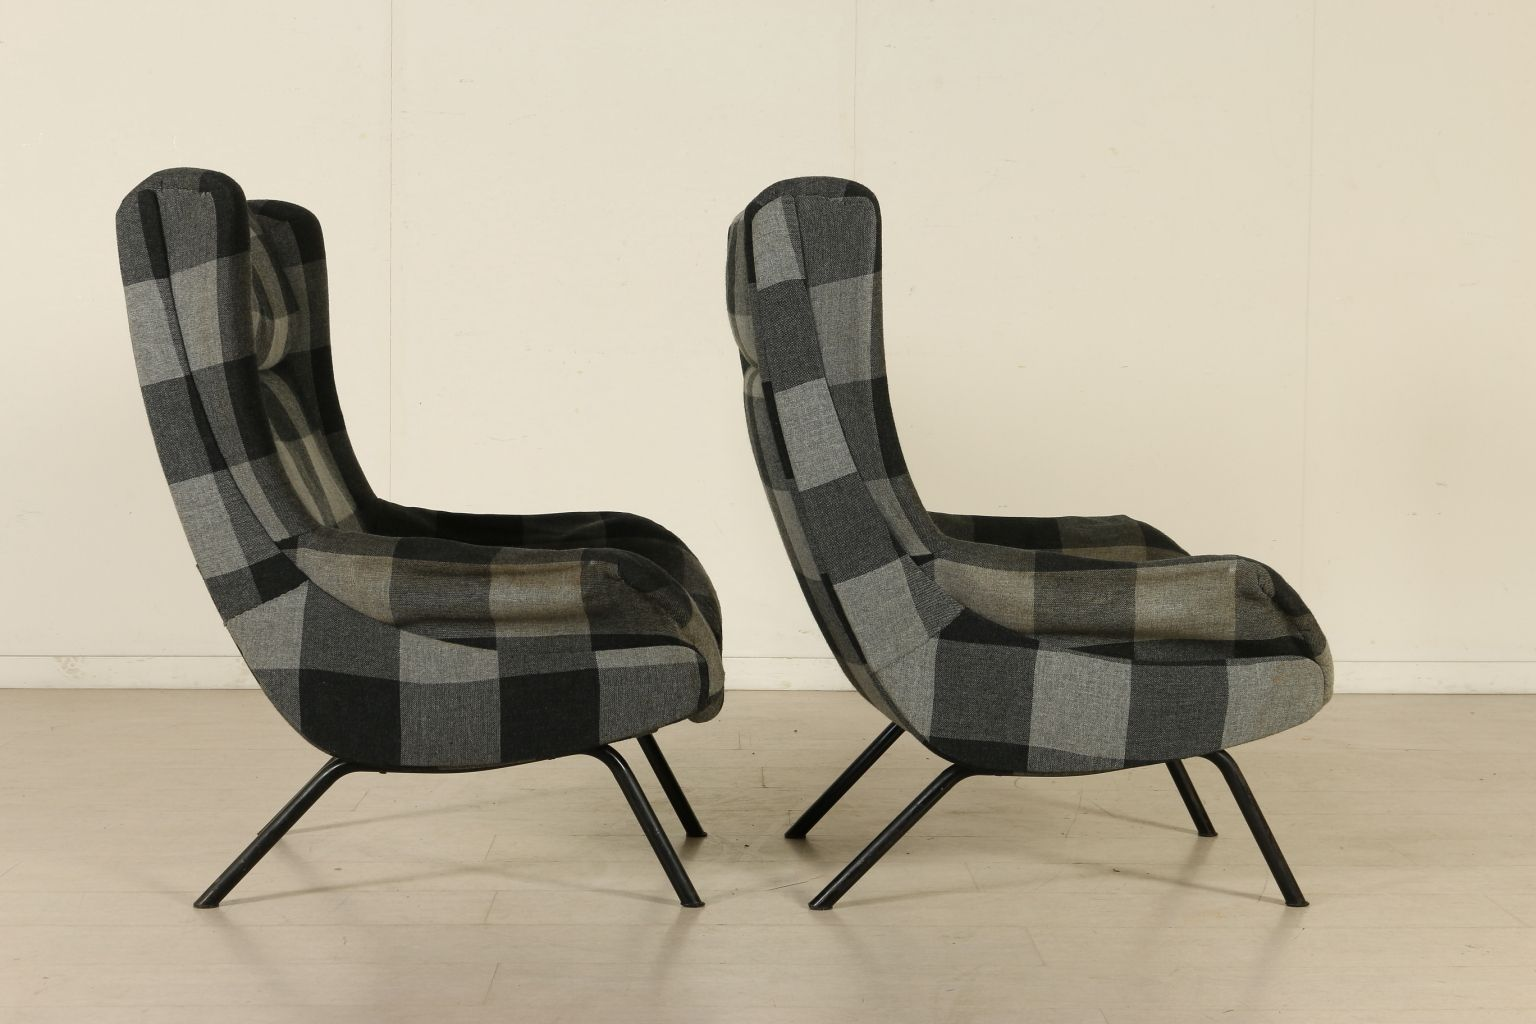 Italienische sessel mit verstellbaren kopflehnen 1950er for Italienische sessel design